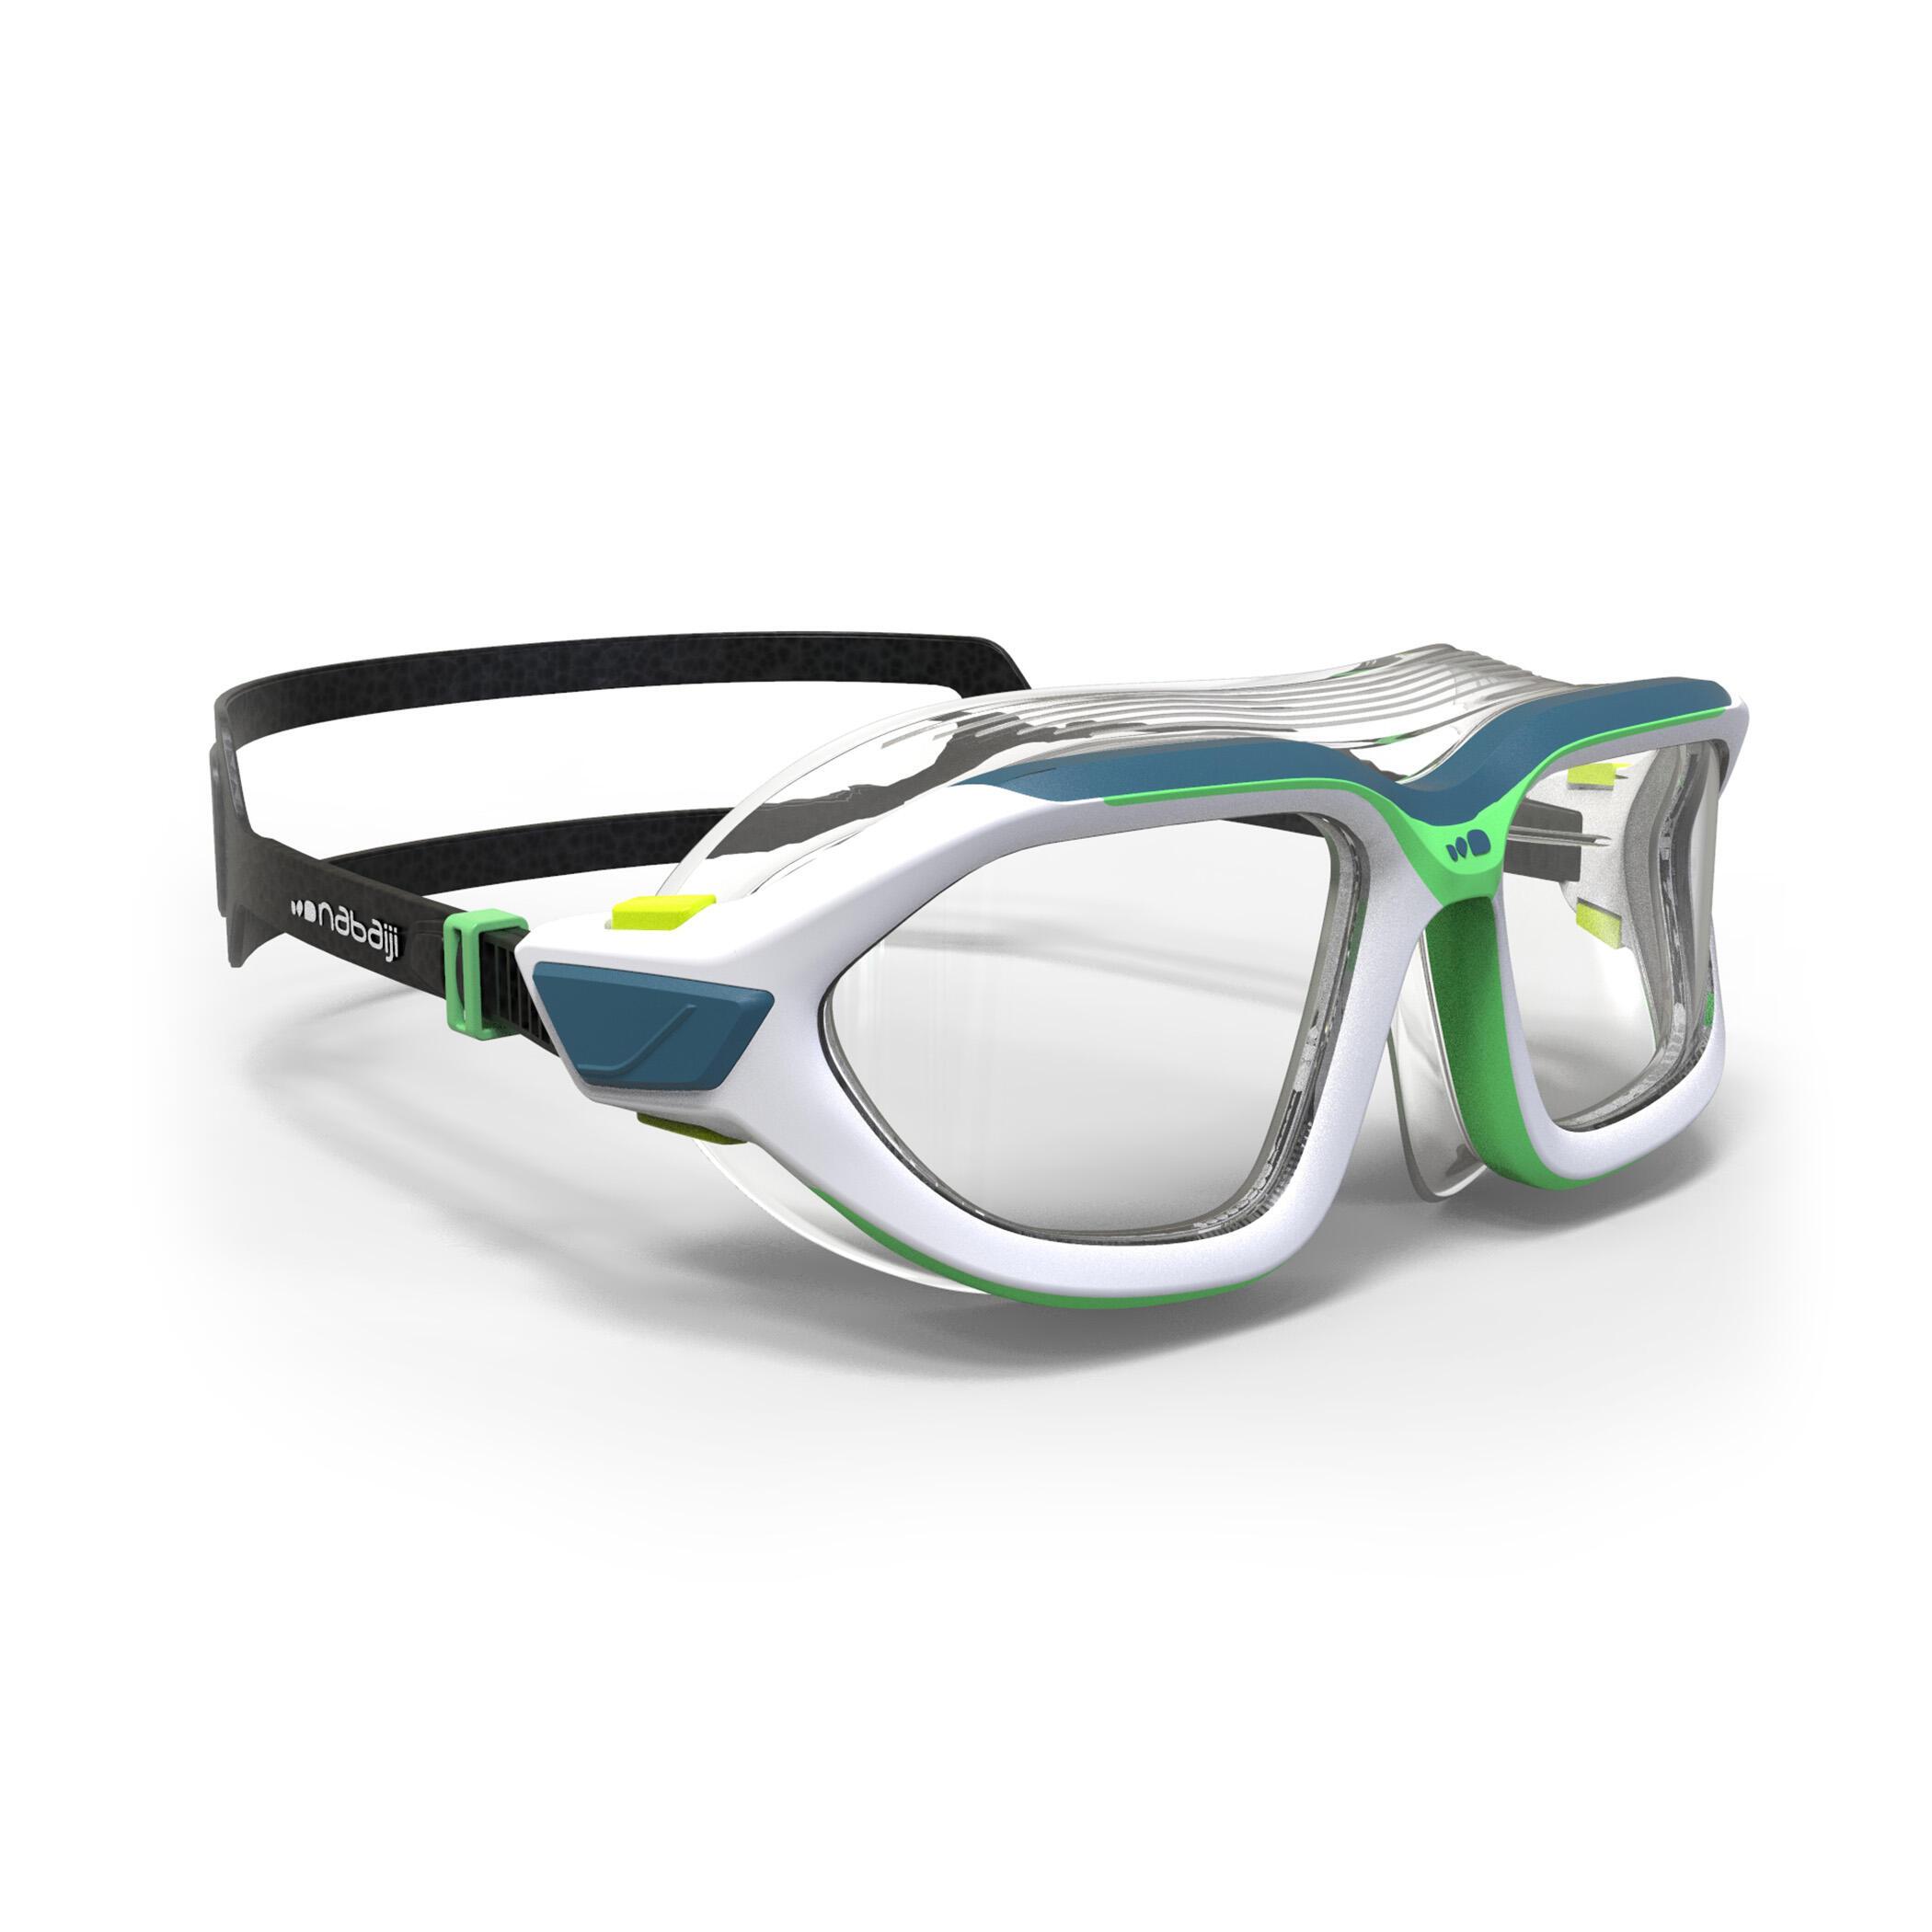 Ochelari Înot Active S imagine